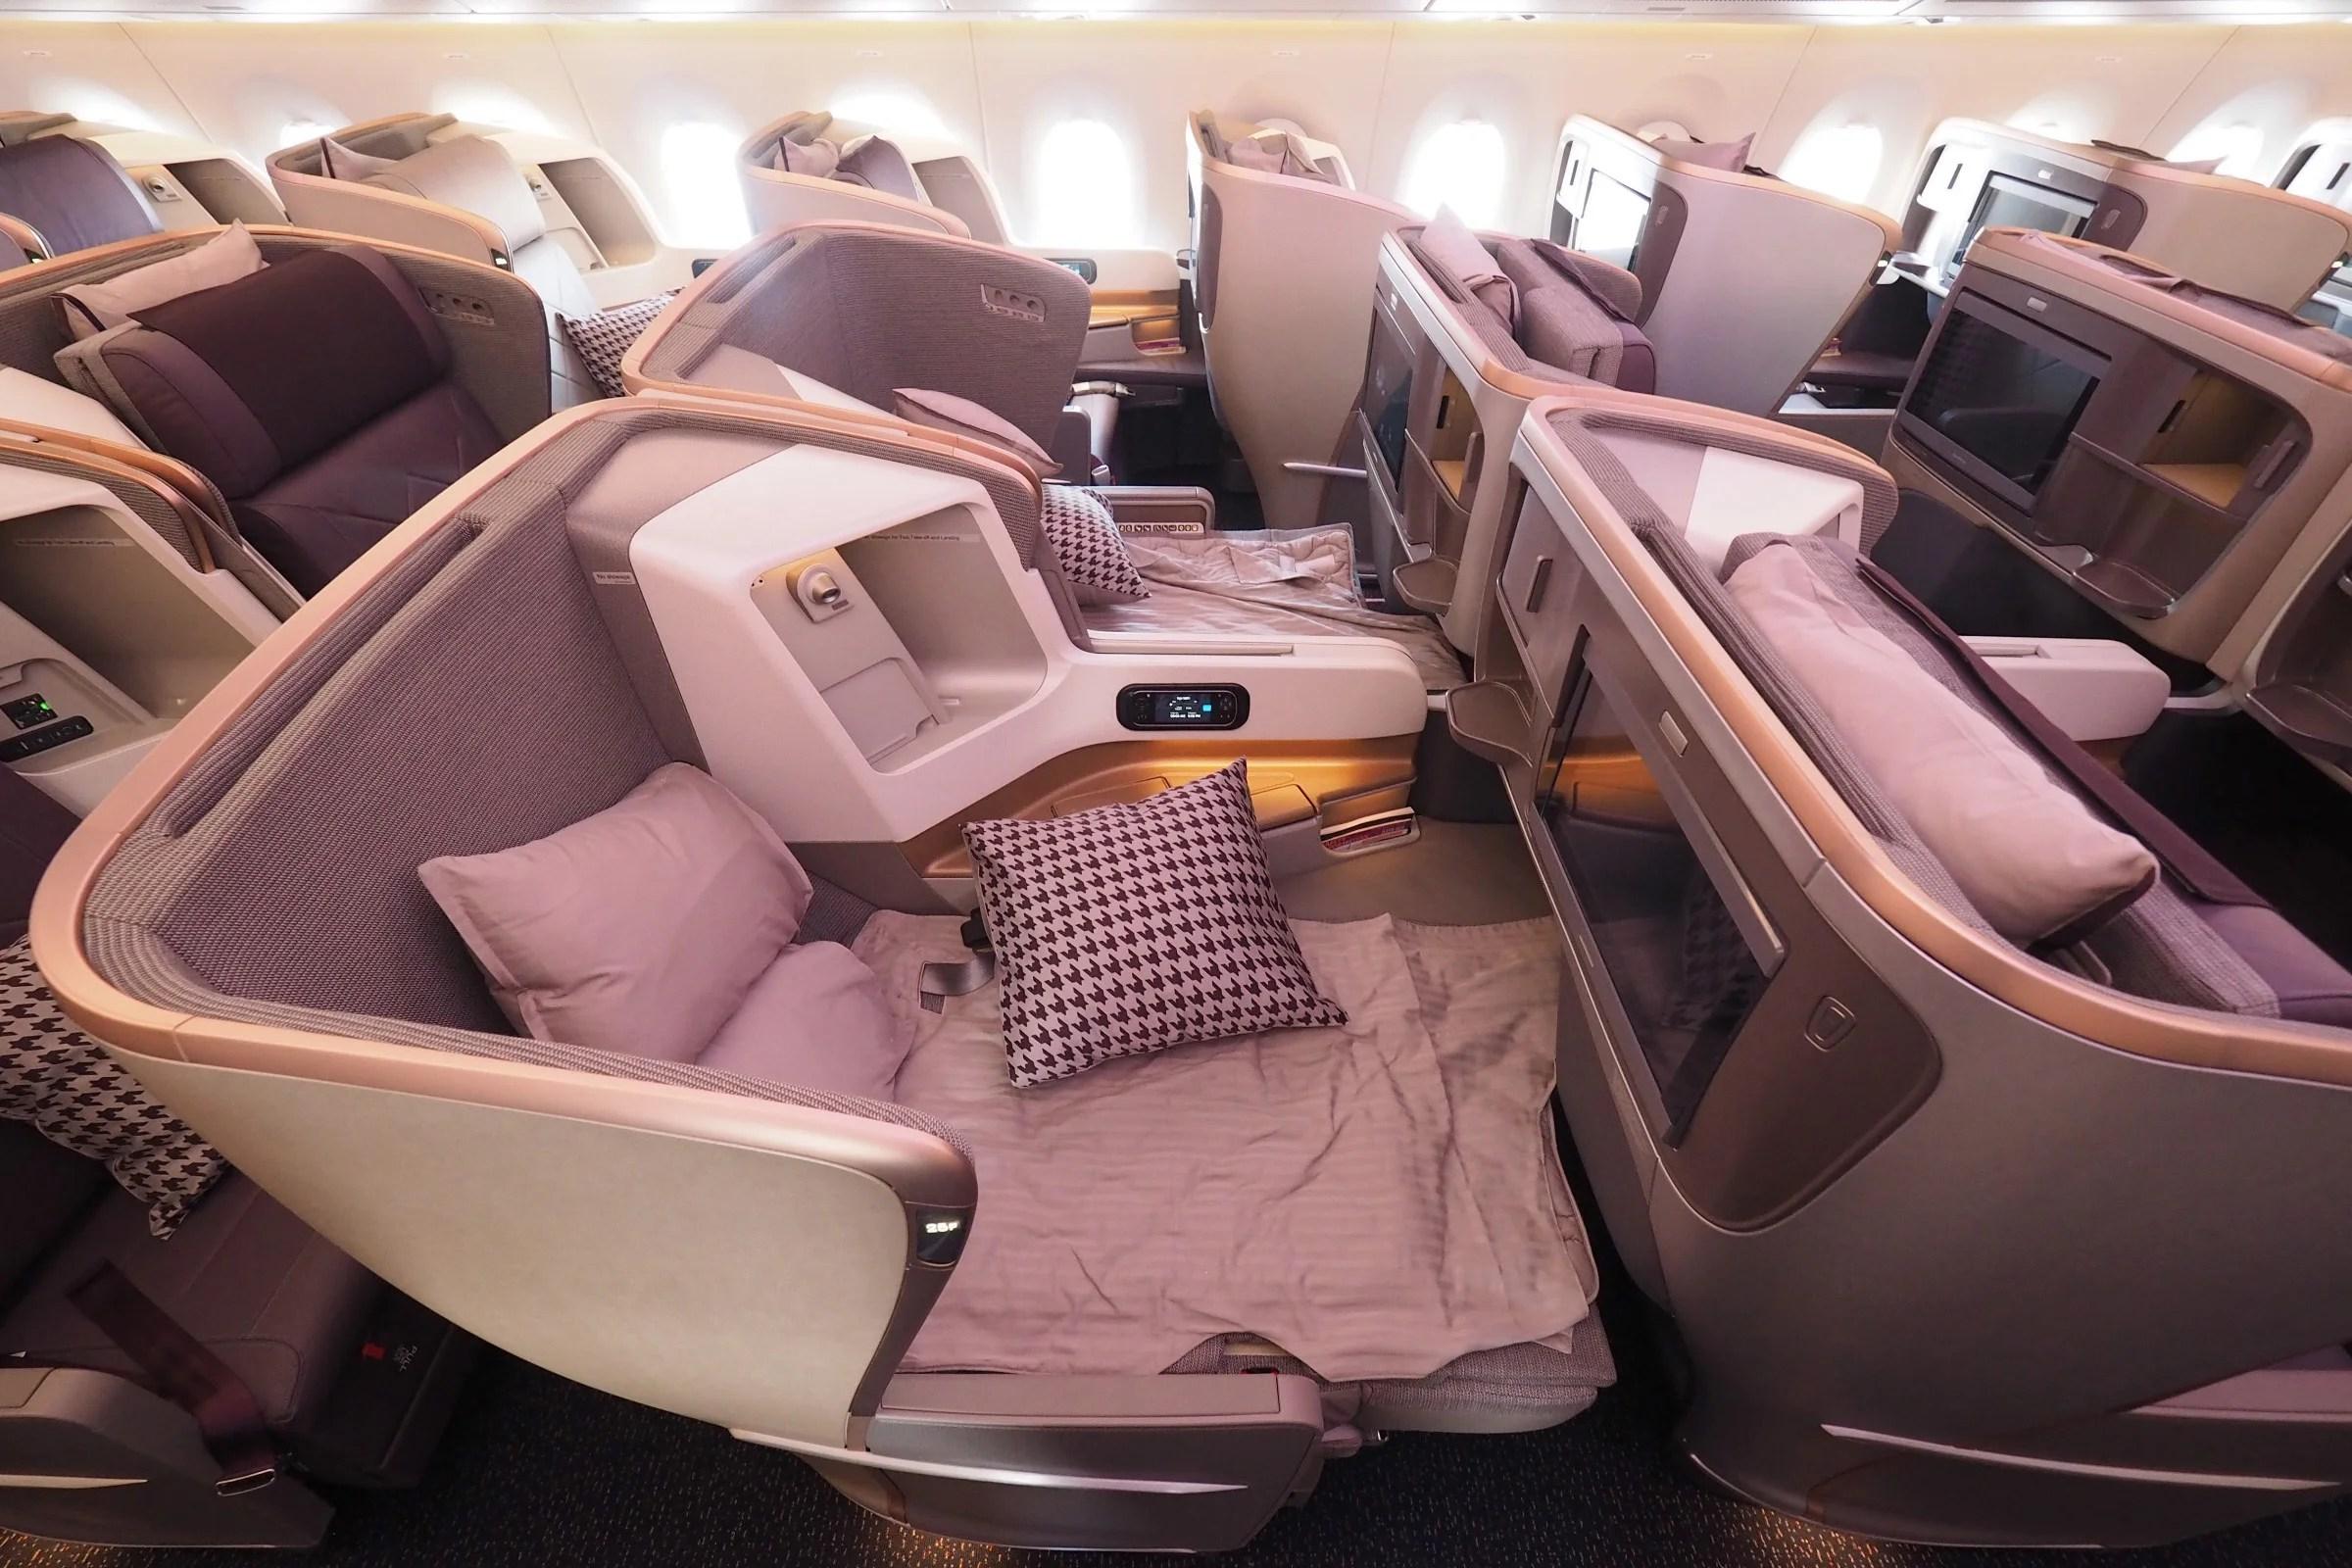 Score 30% off premium economy, business class awards on Singapore Airlines through 'Spontaneous Escapes'